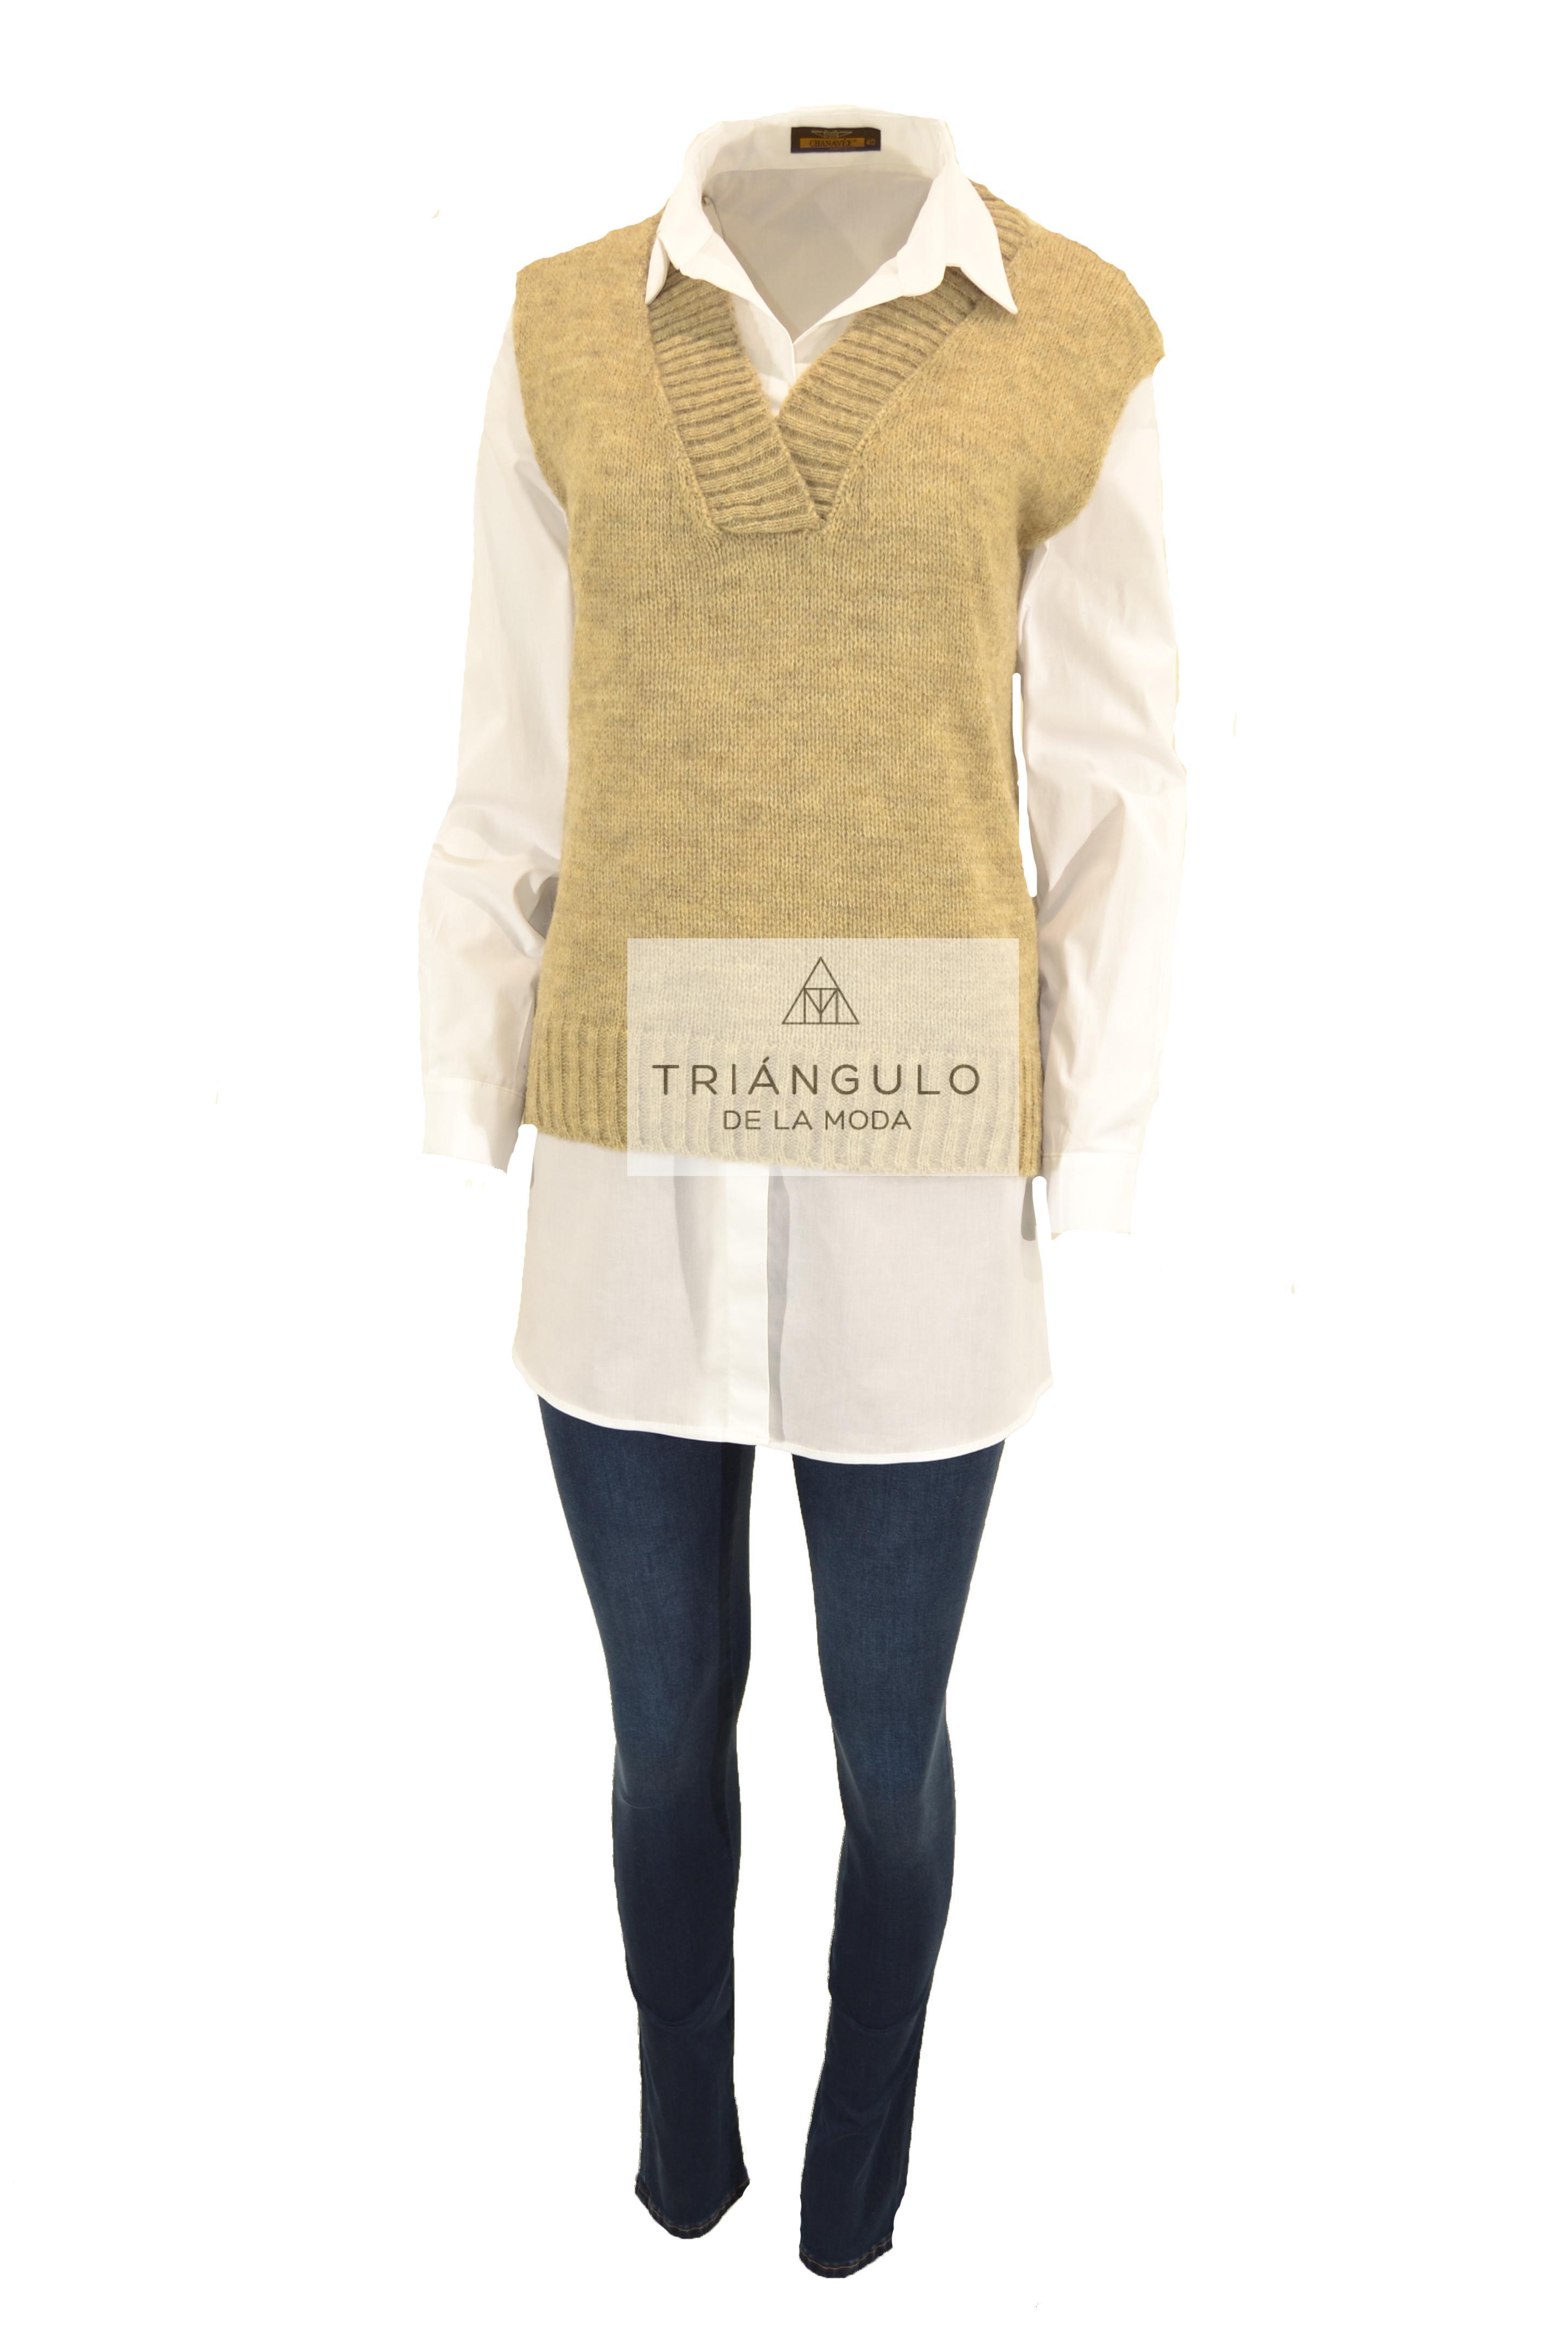 Tienda online del Triangulo de la Moda CHALECO PUNTO